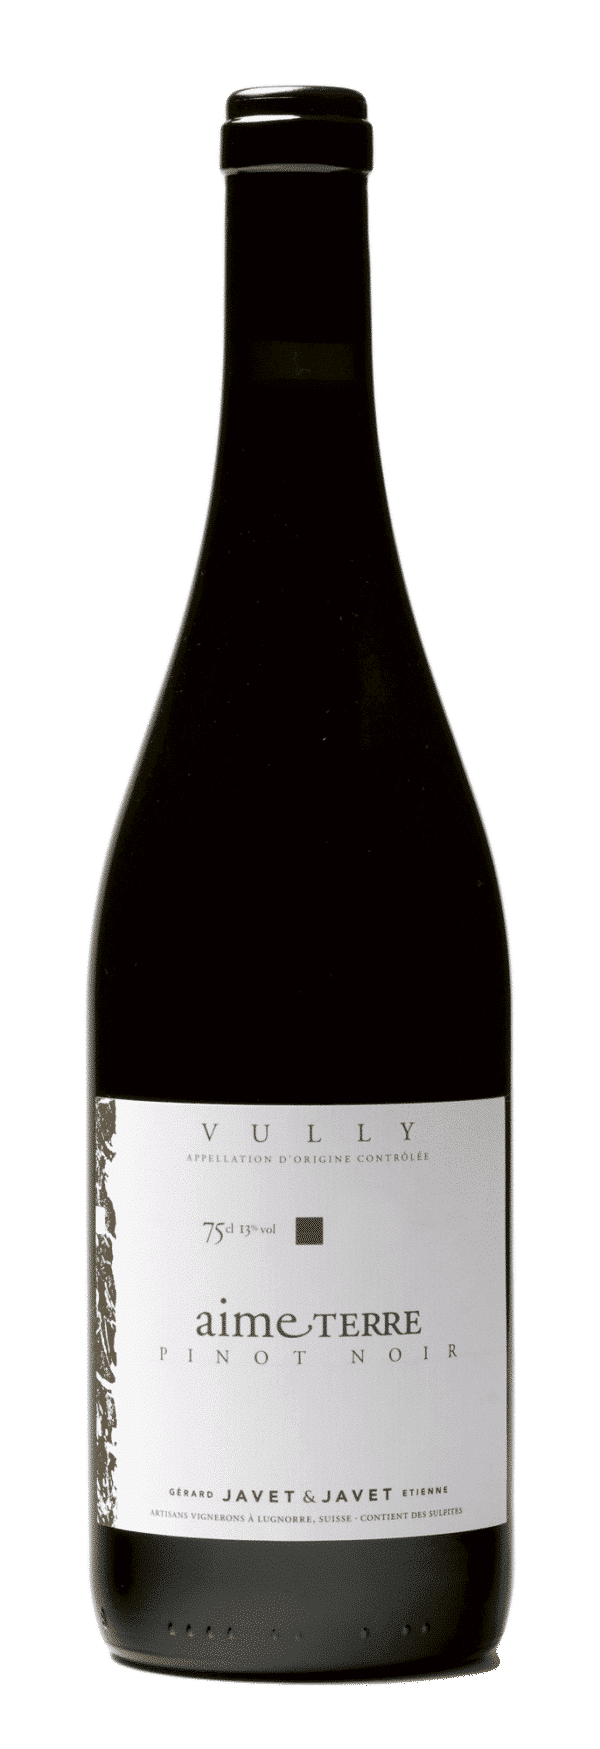 AimeTerre Pinot Noir